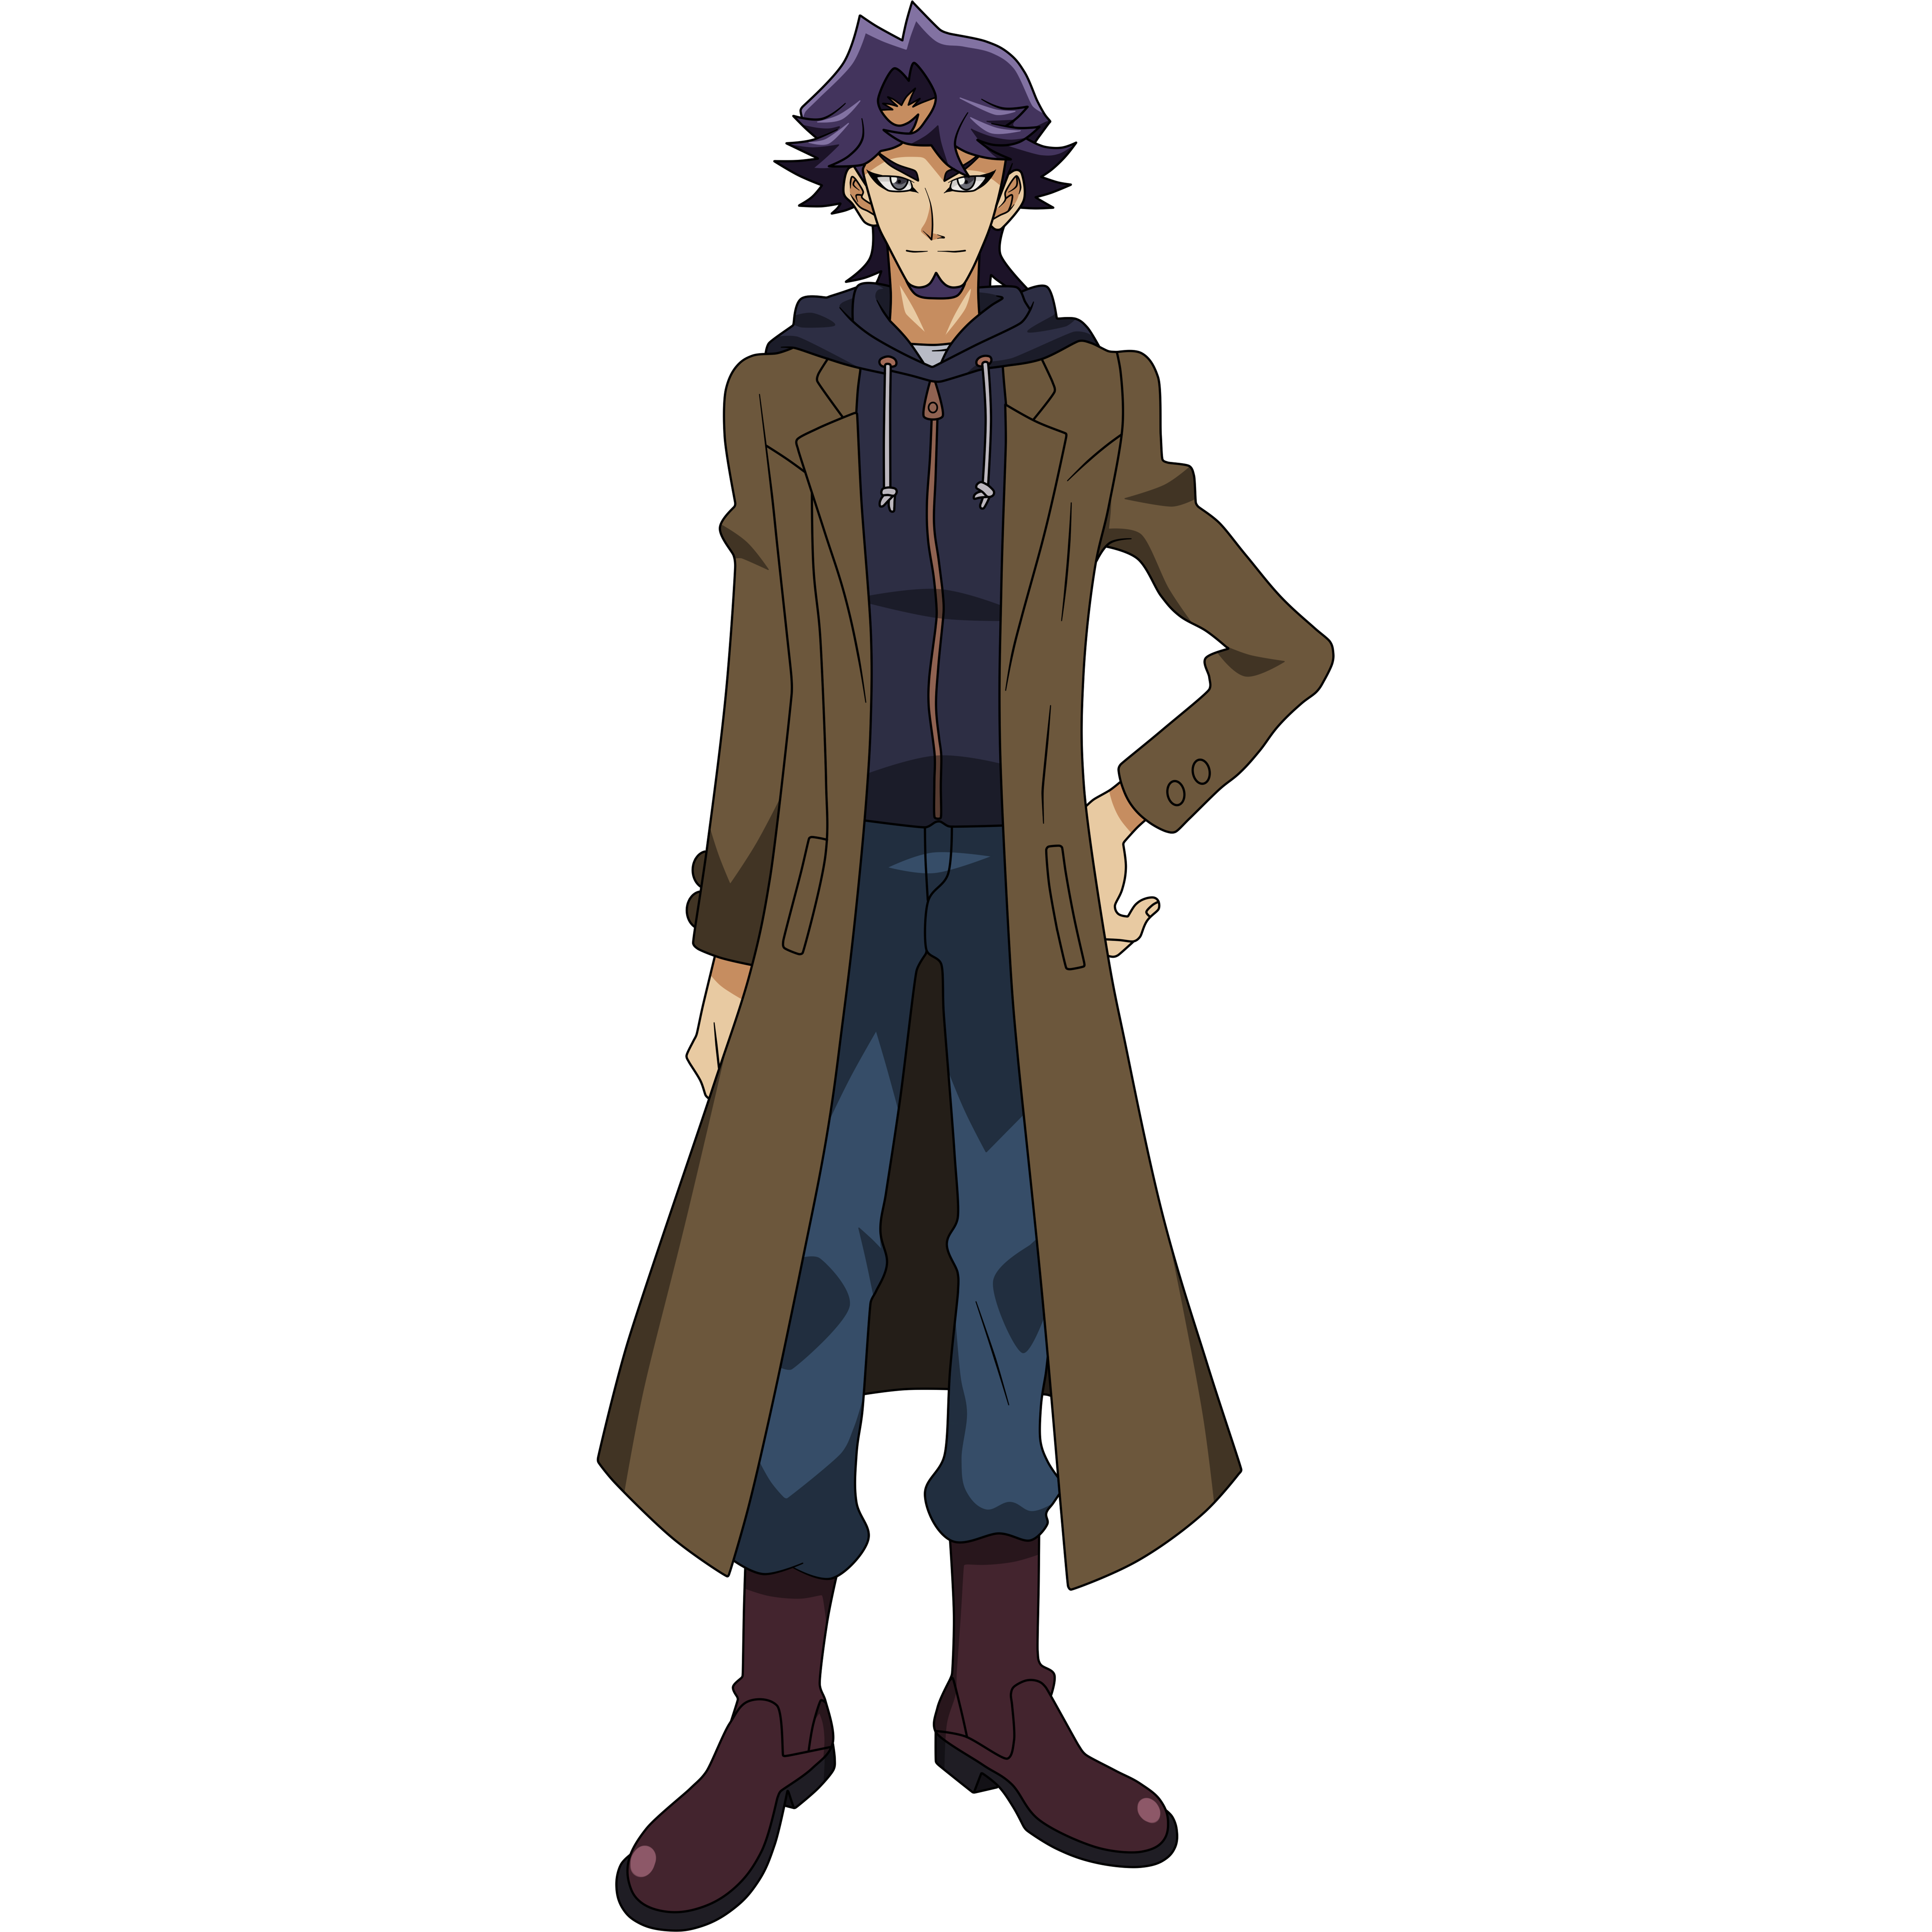 Yugioh Character Design : Kusanagi shouichi yu gi oh vrains image